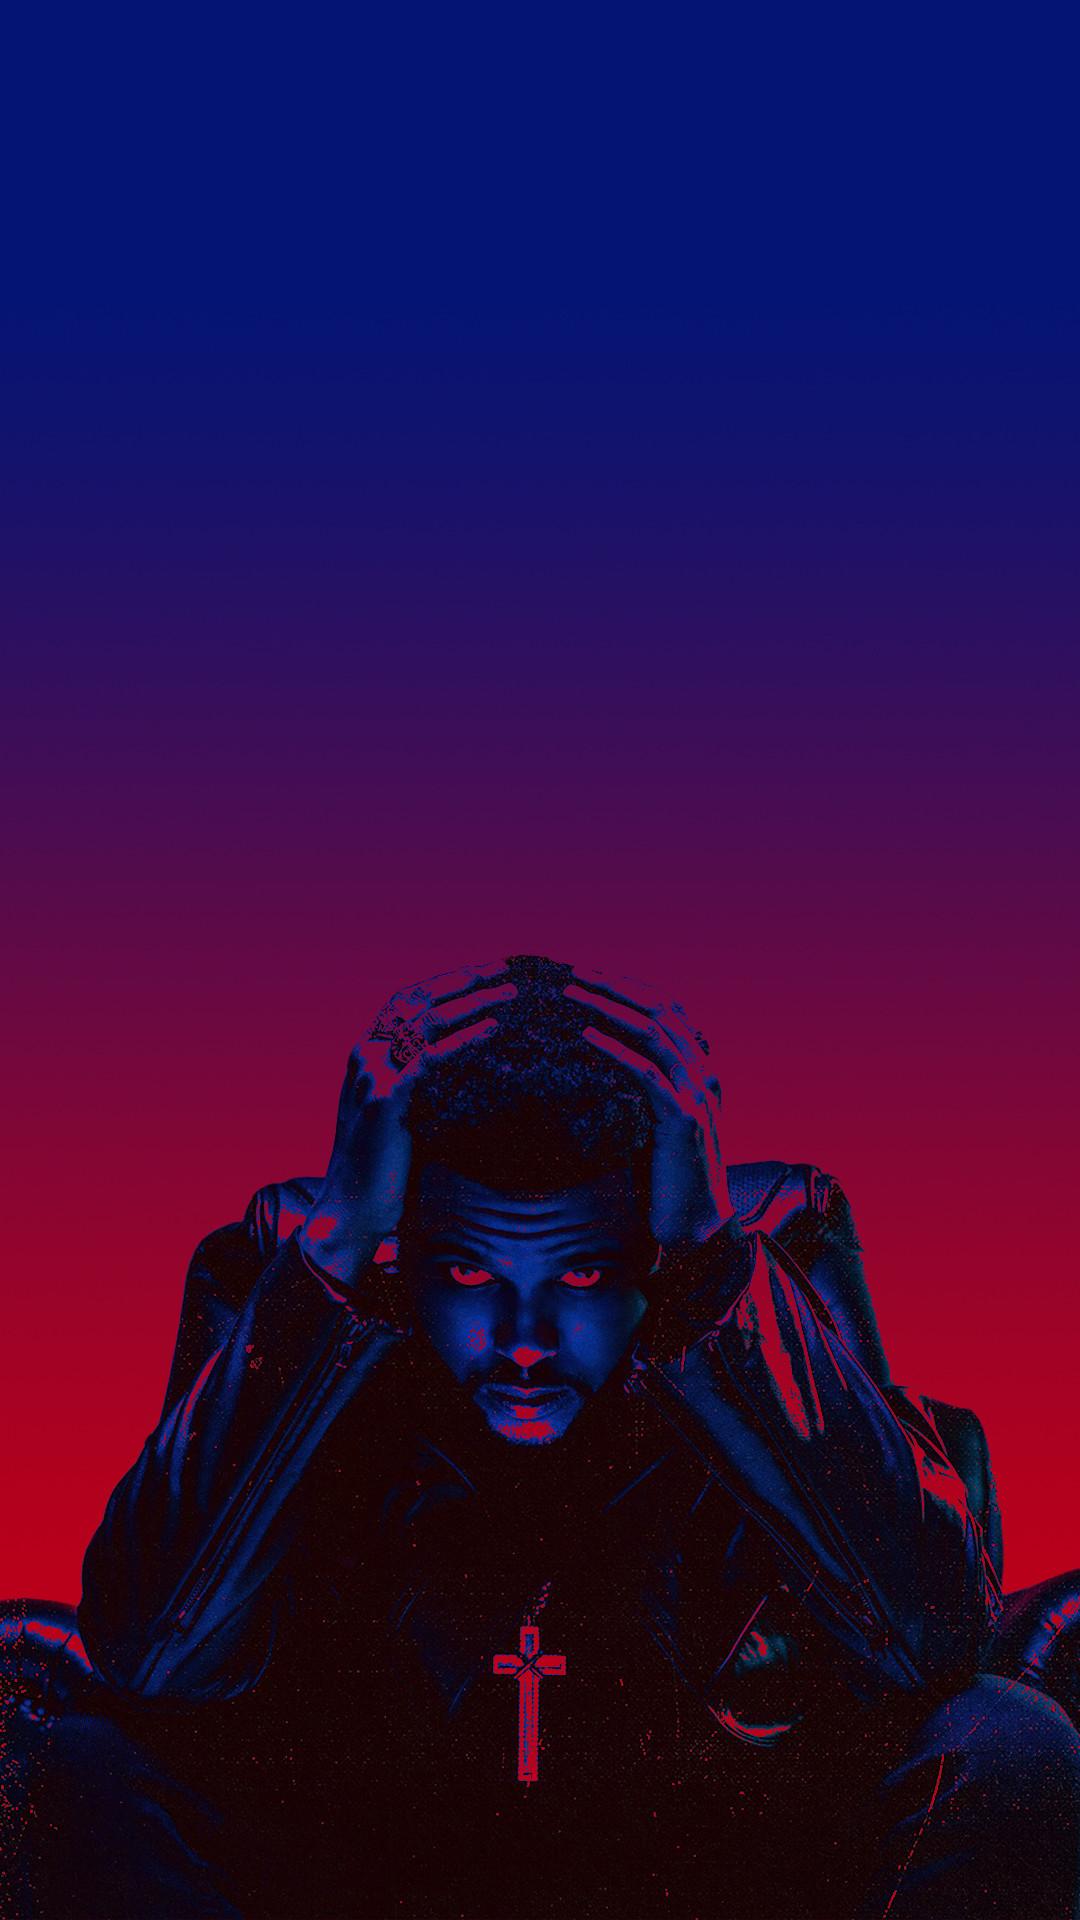 The Weekend Artist Xo Download